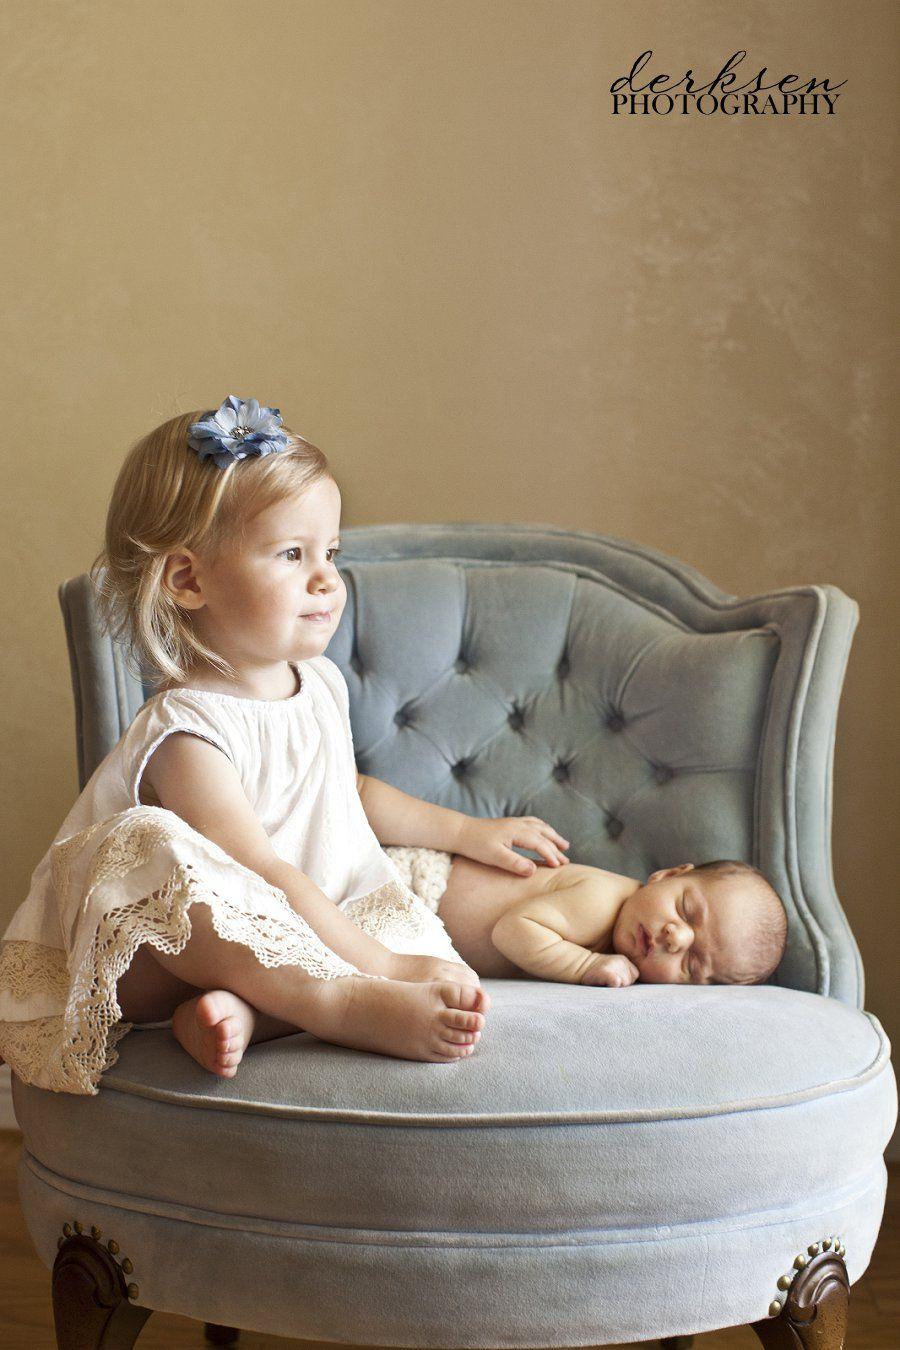 Newborn baby photography poses